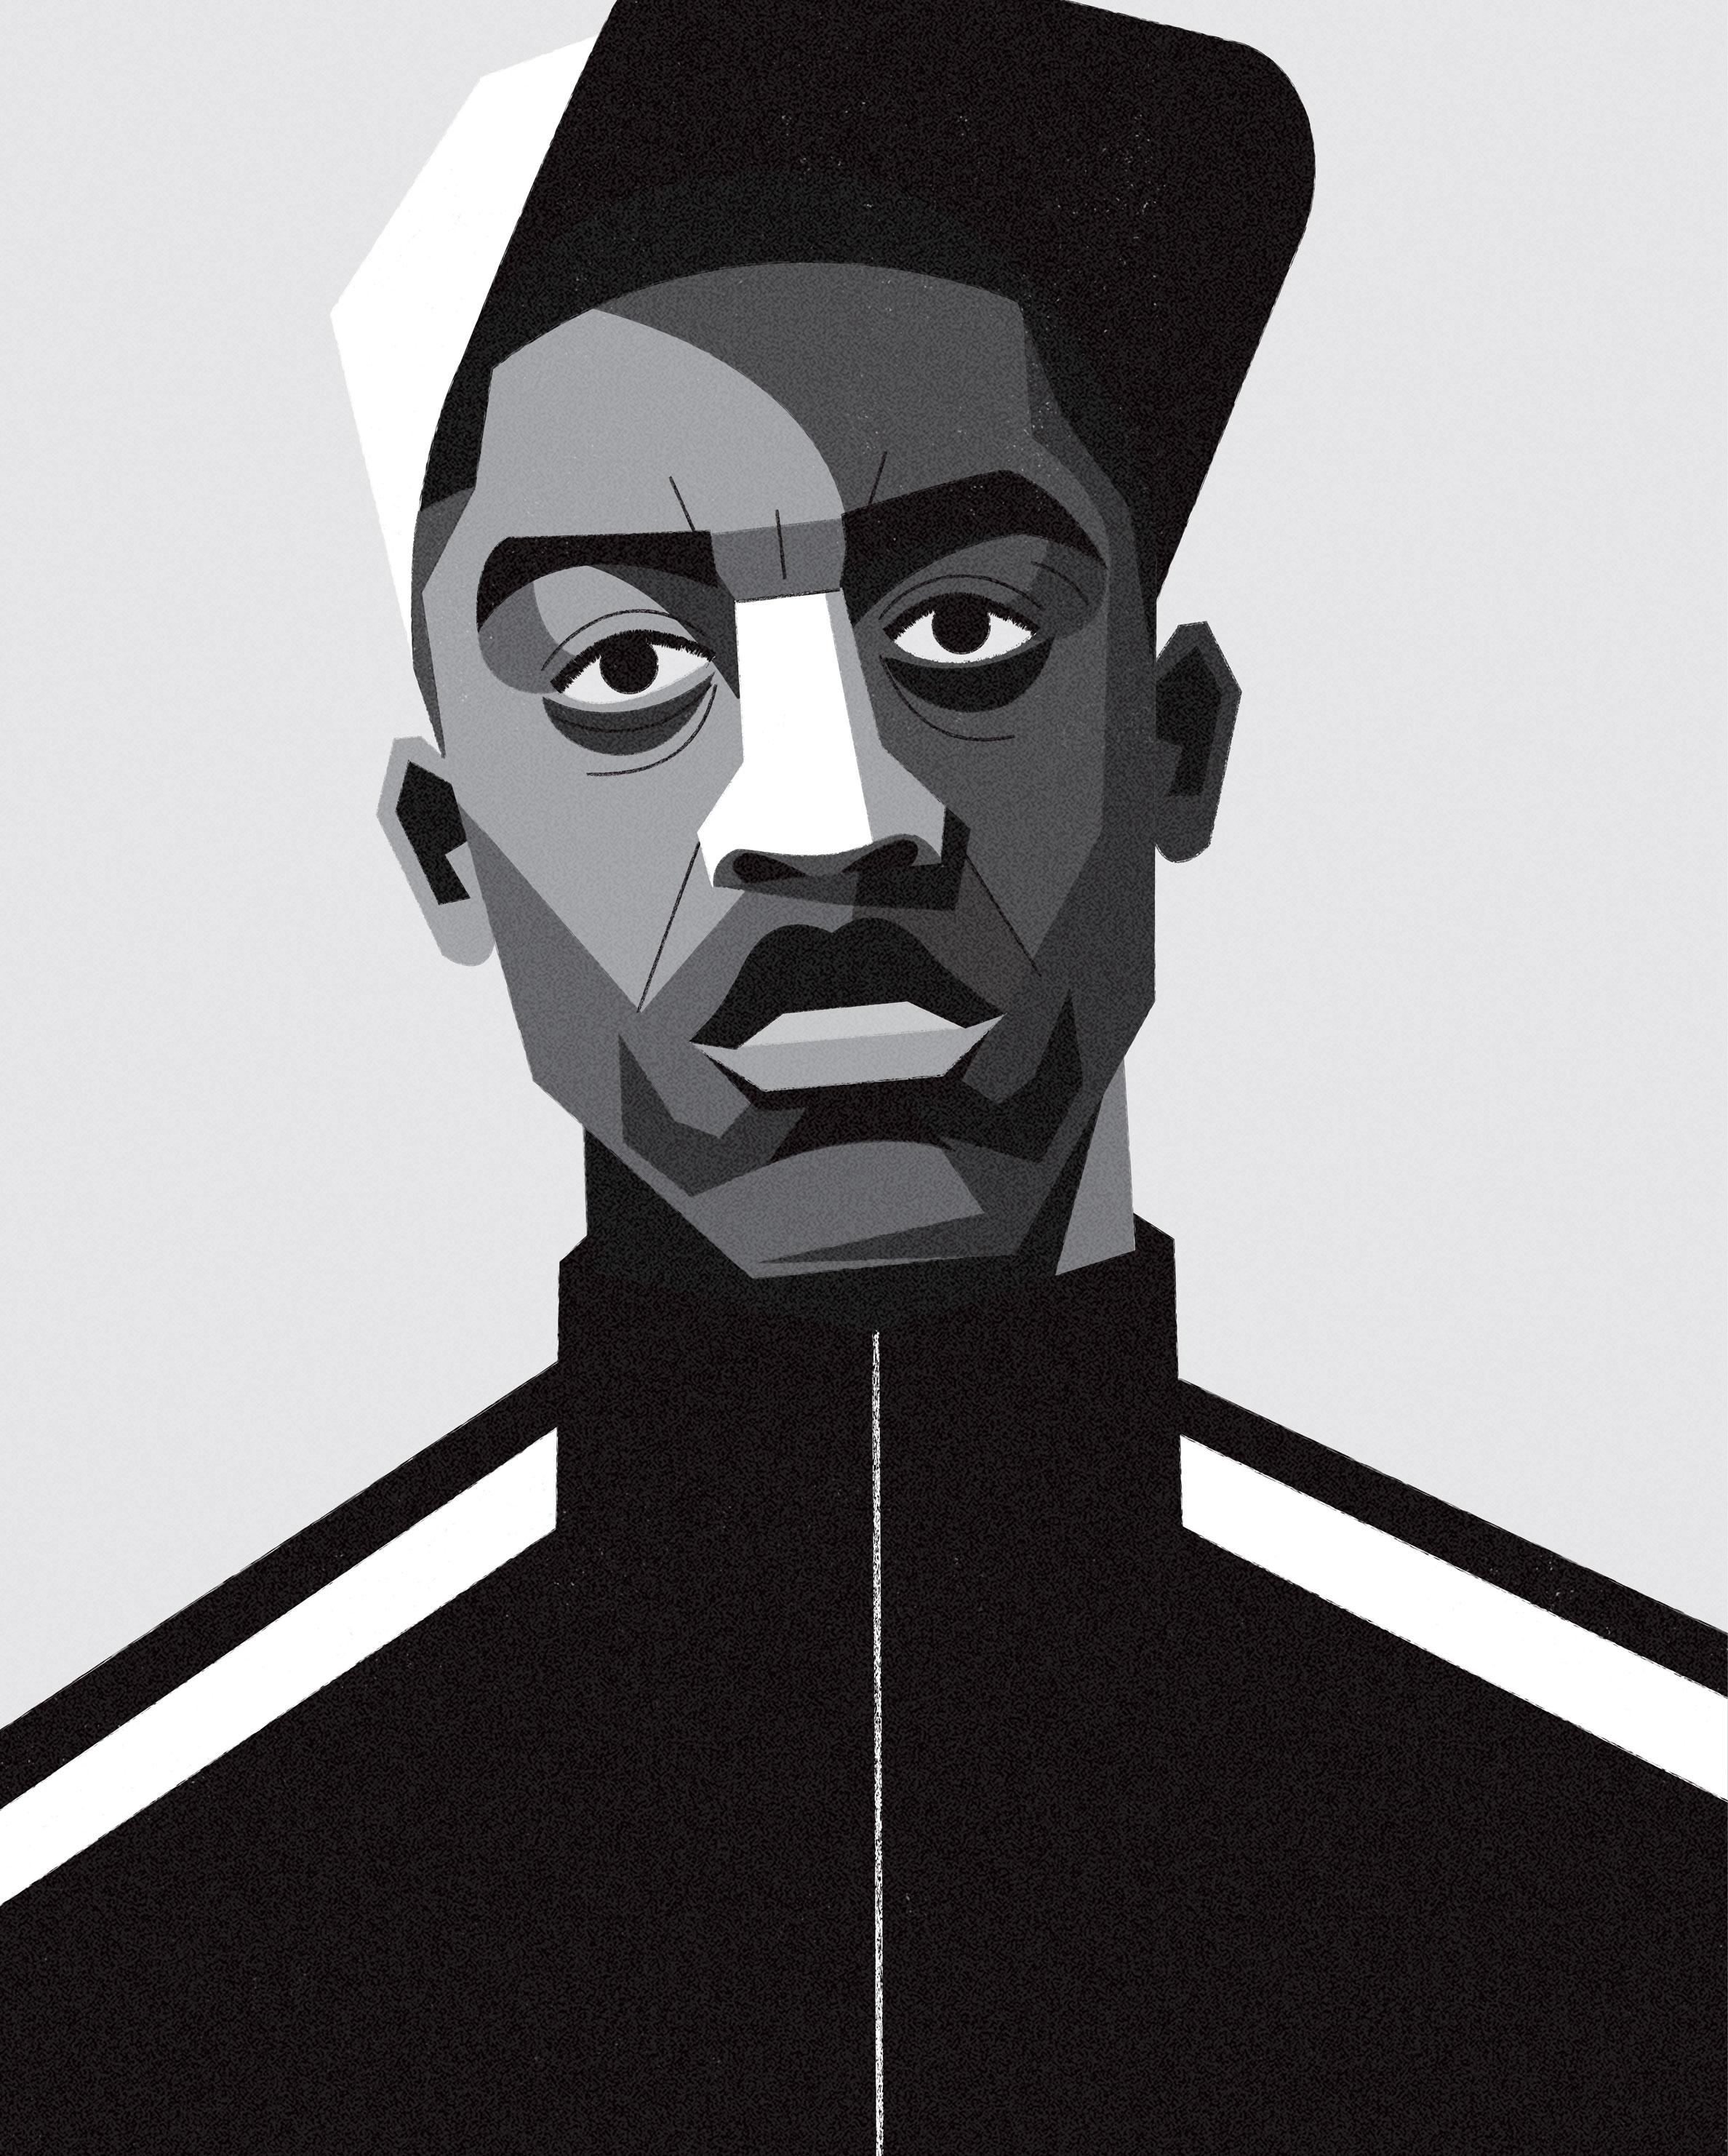 dale edwin murray freelance illustrator wiley grime uk portrait illustration